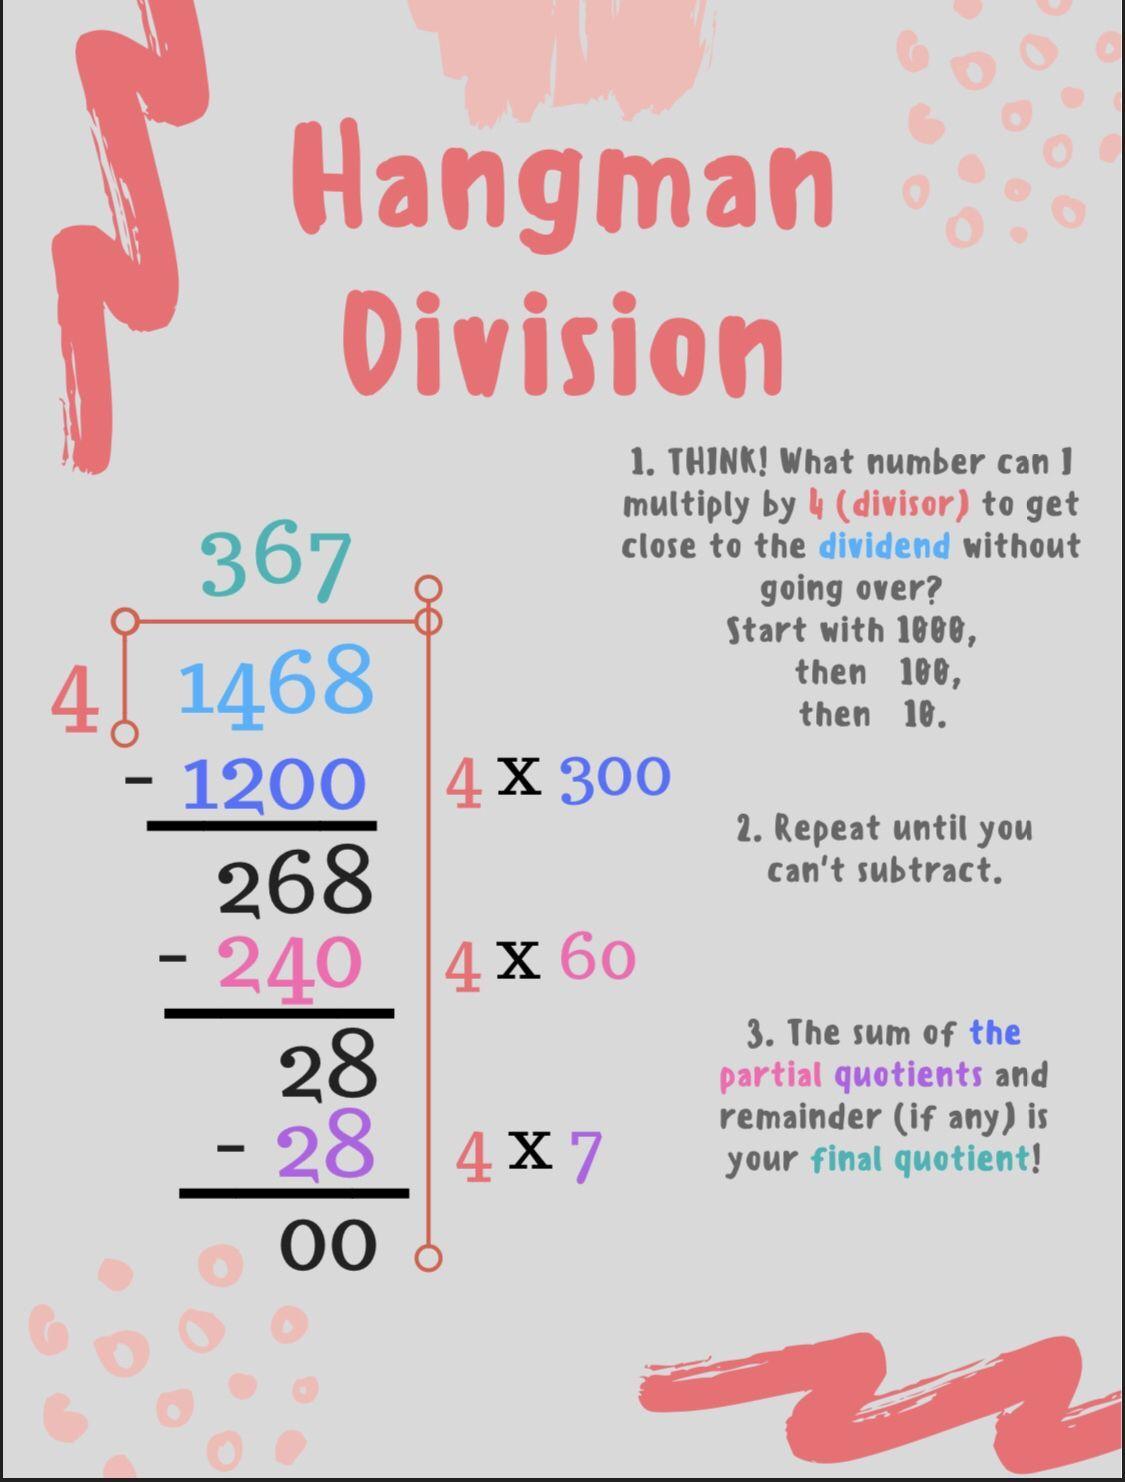 Division Using Partial Quotients In